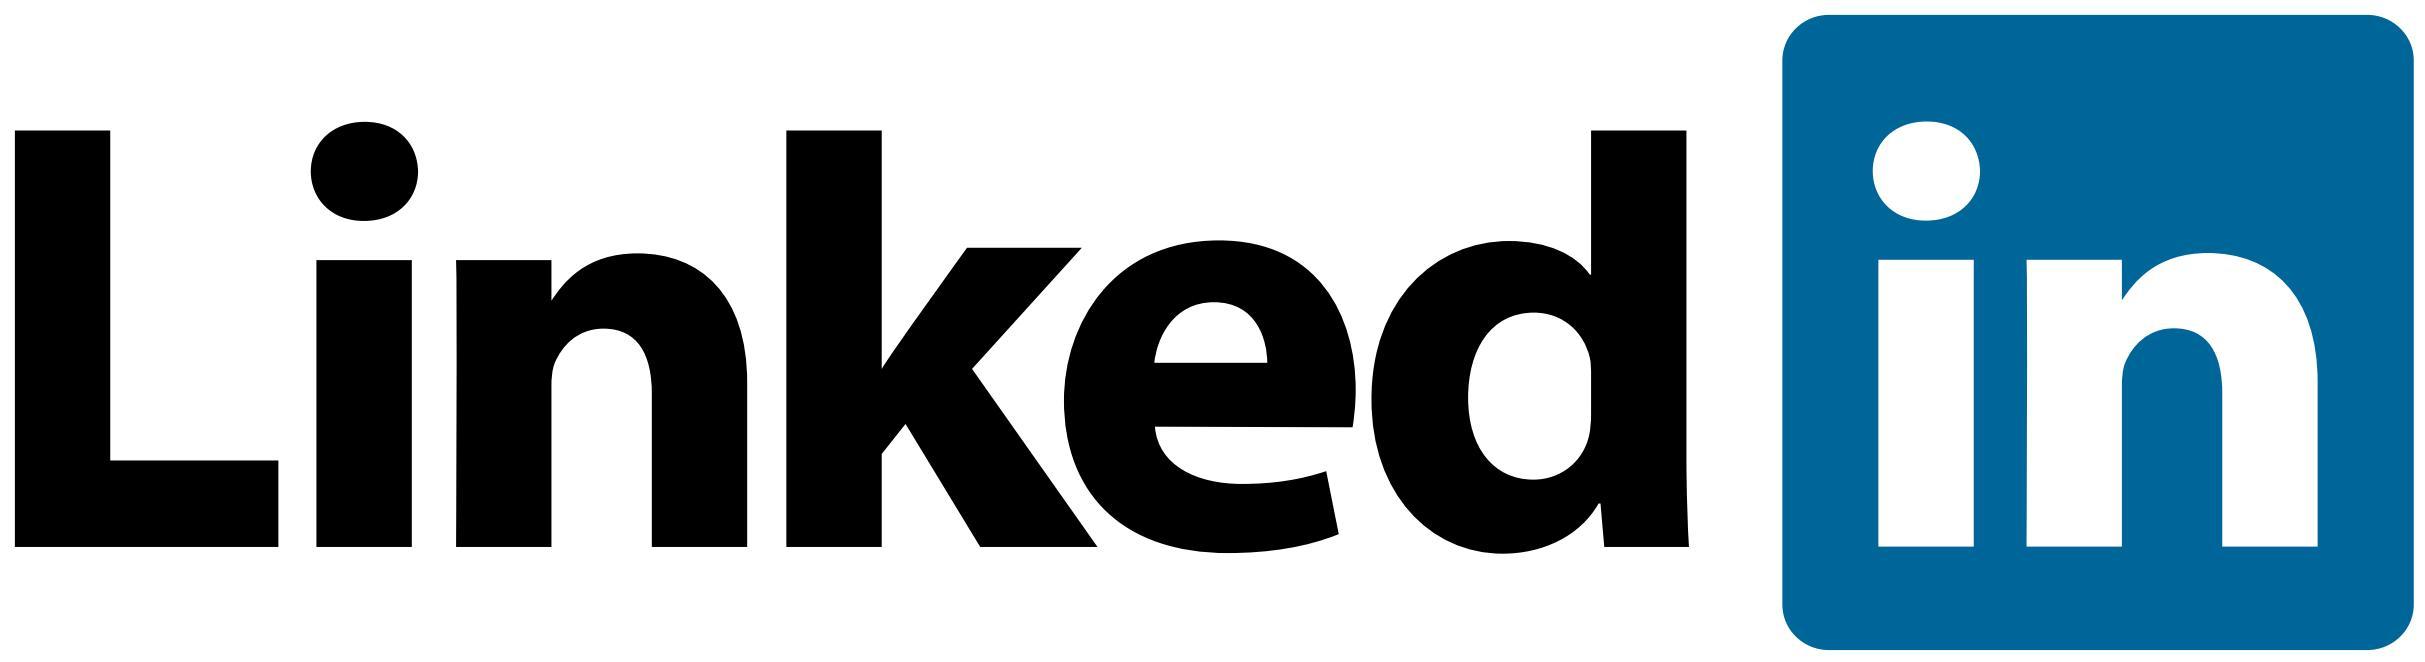 logo</td